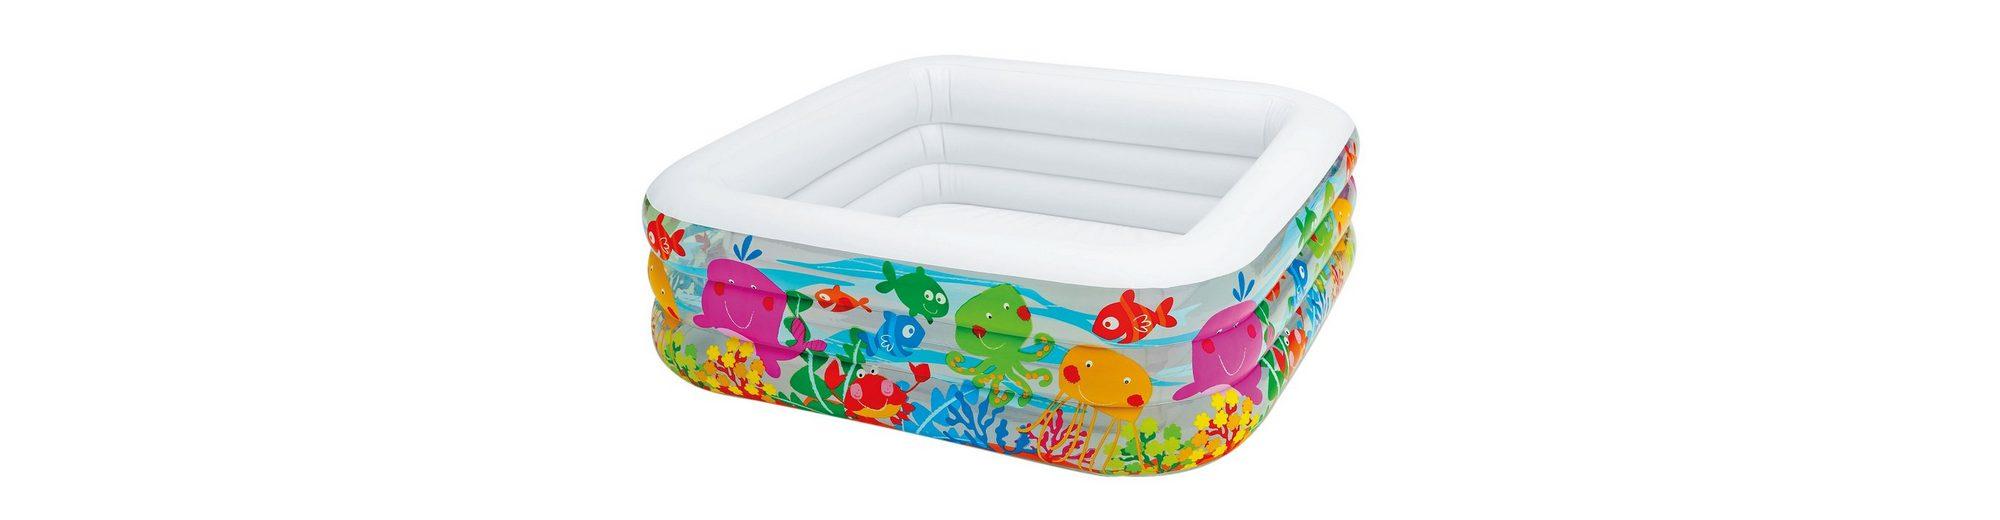 Intex Kinder Pool, »Clearview Aquarium«